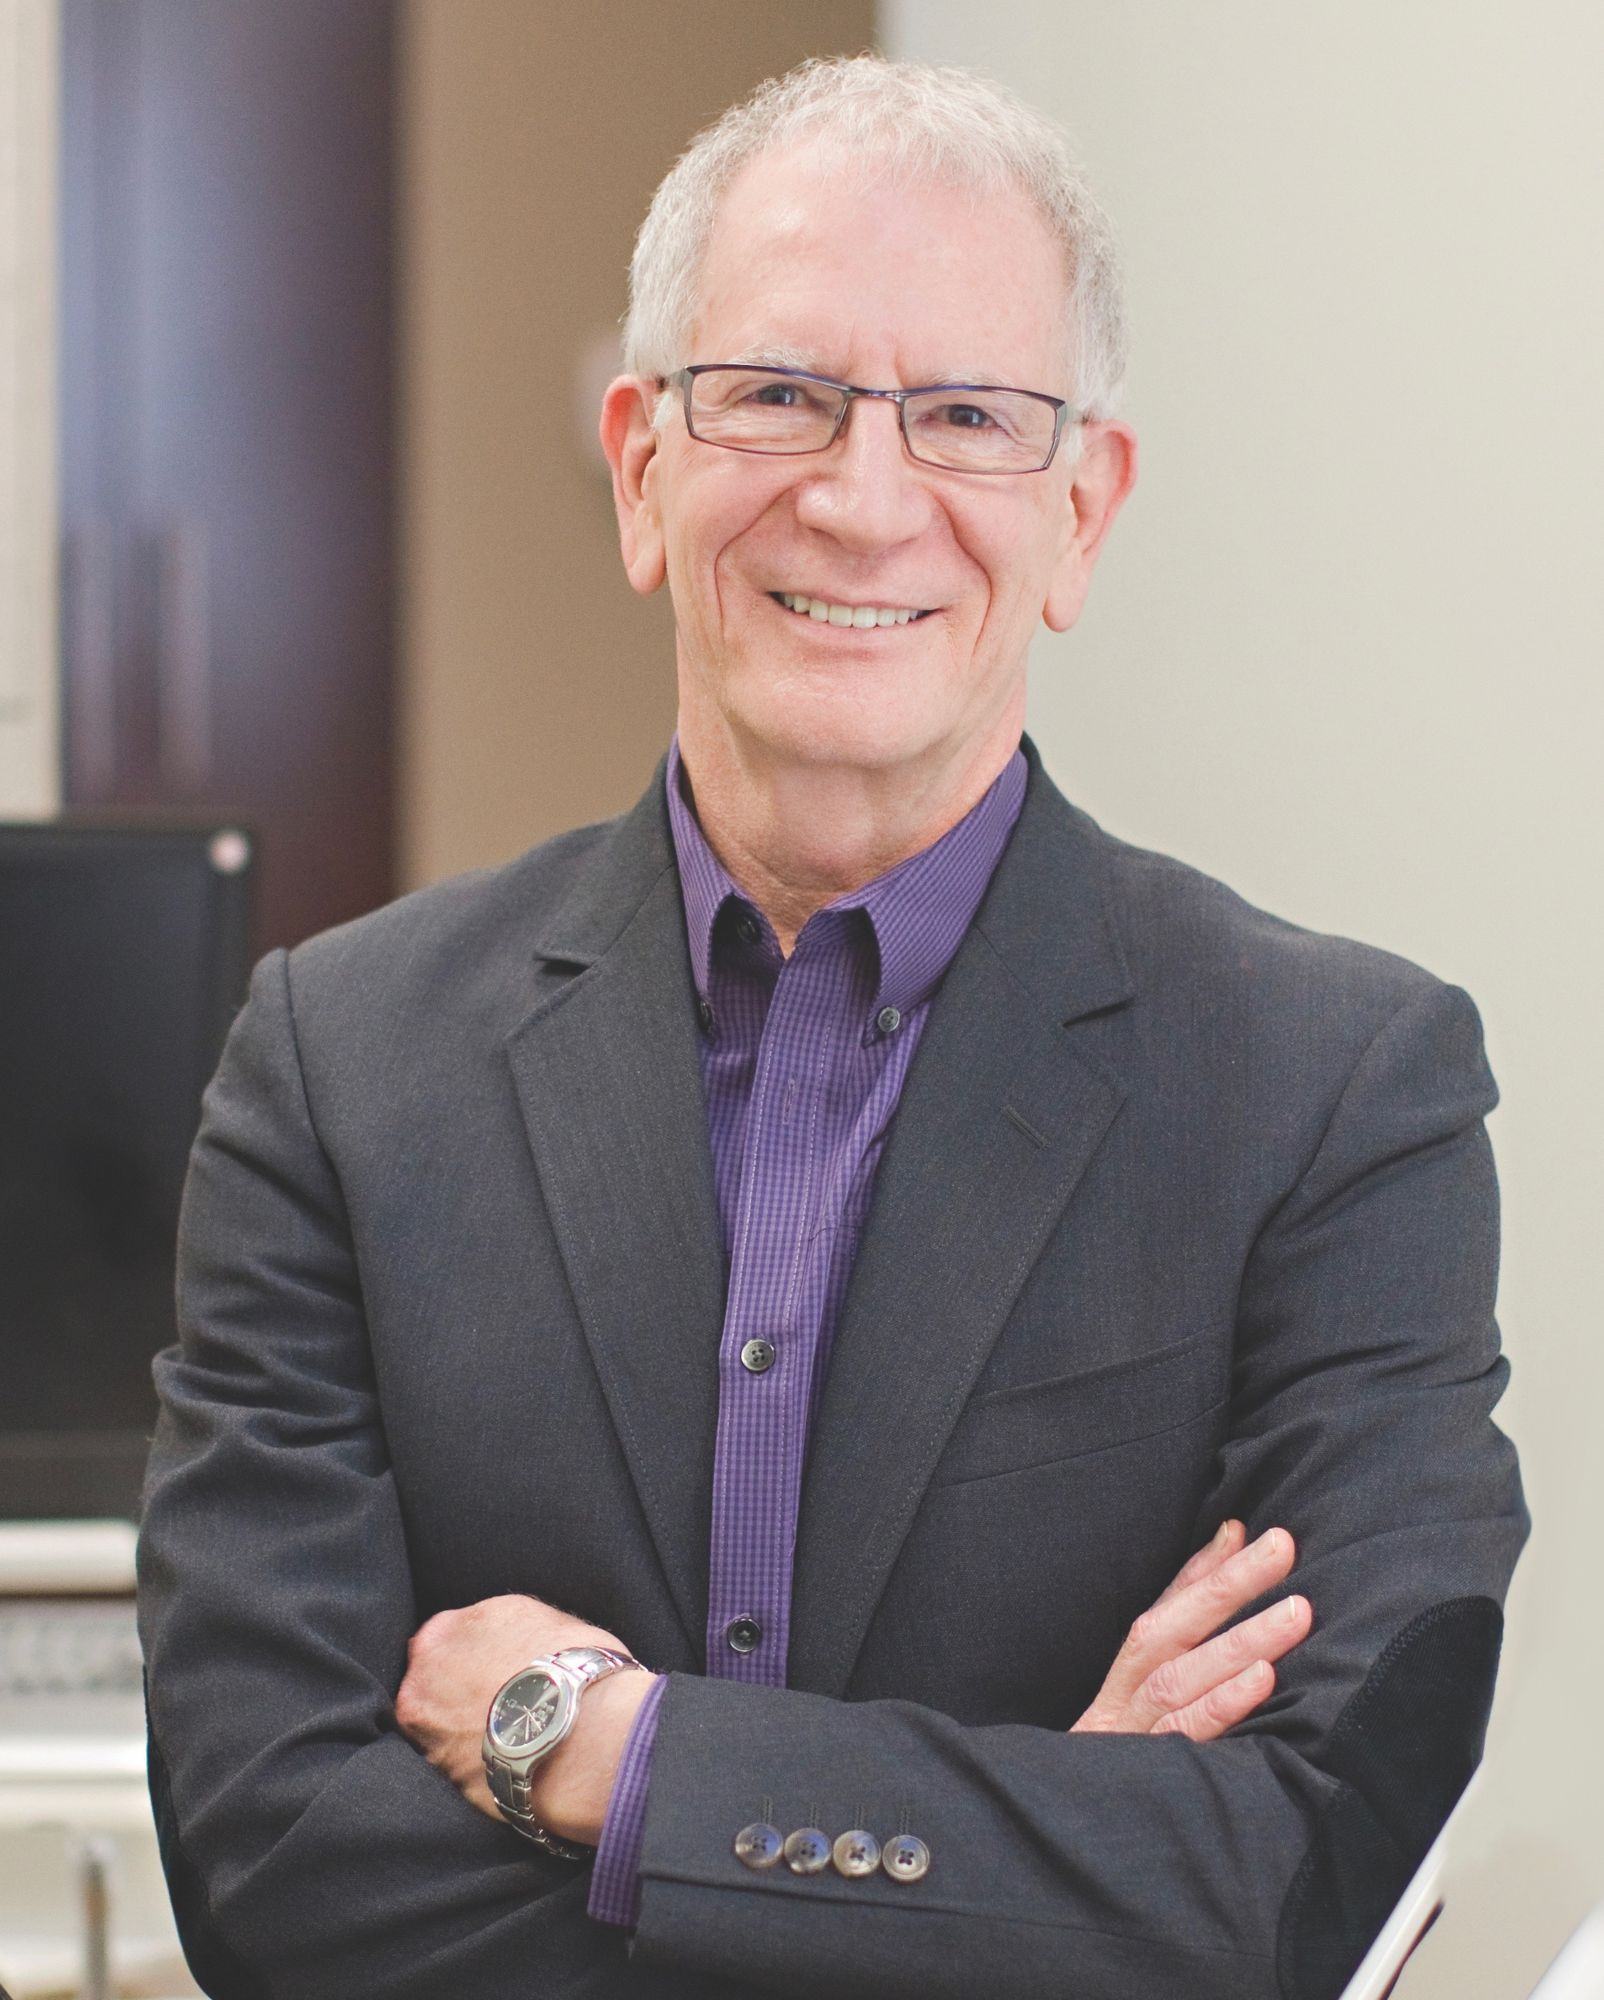 Doktor Al Danenberg